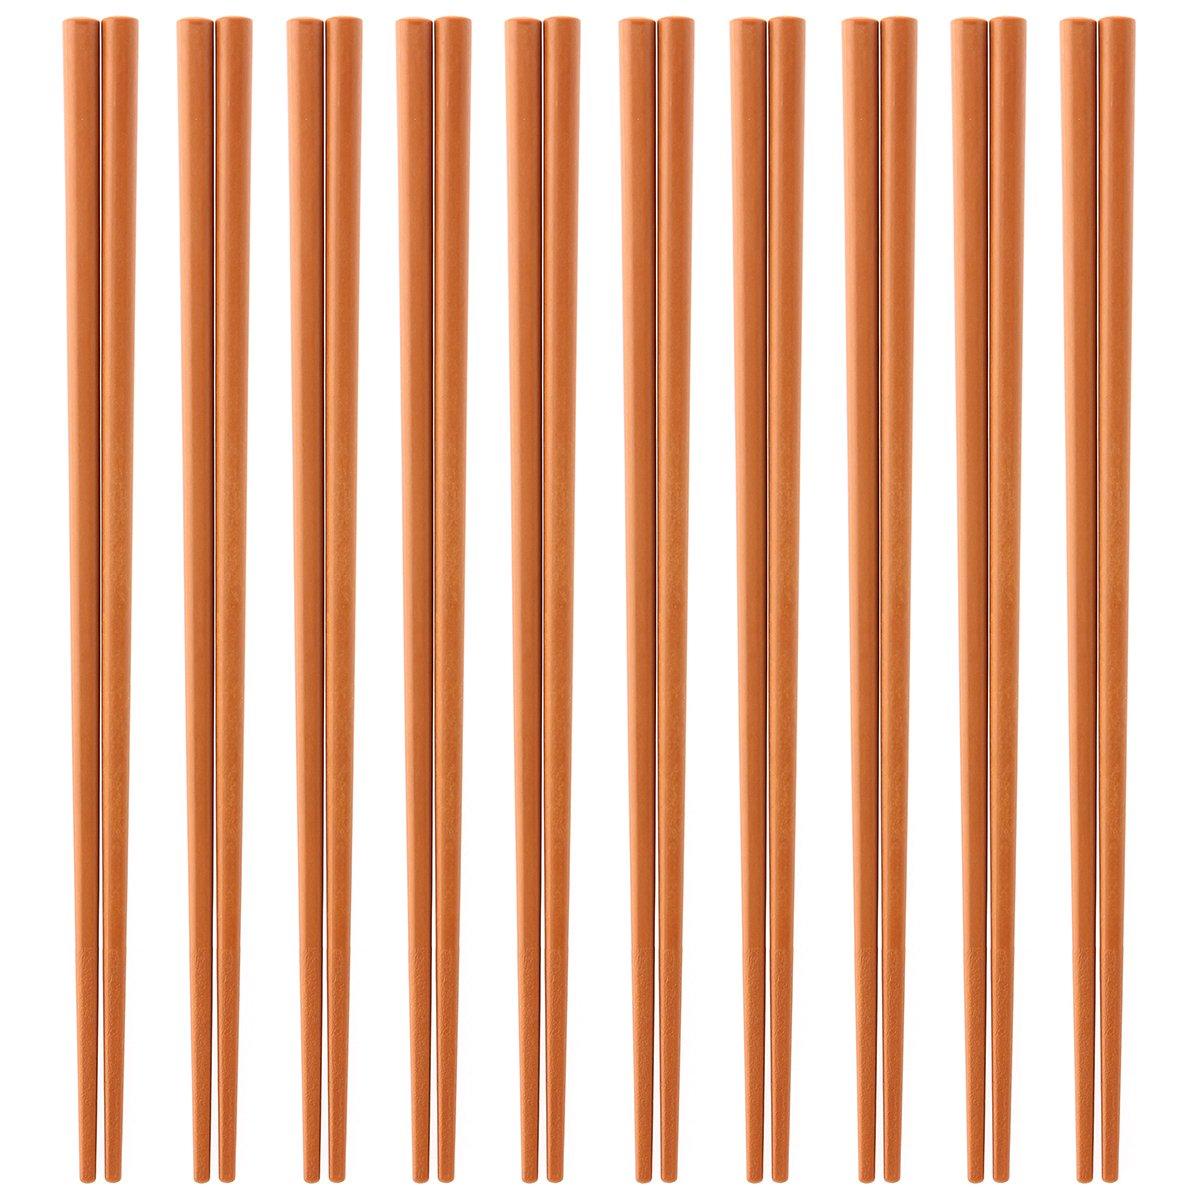 Made in Japan Business for 10 Eco Dishwasher-Safe Chopsticks Set Meal (Light Brown) SPS Resin use Chopsticks ECO Dishwasher, high Temperature and Depot Support 22.5cm x 3mm Angle (Chopsticks Point)